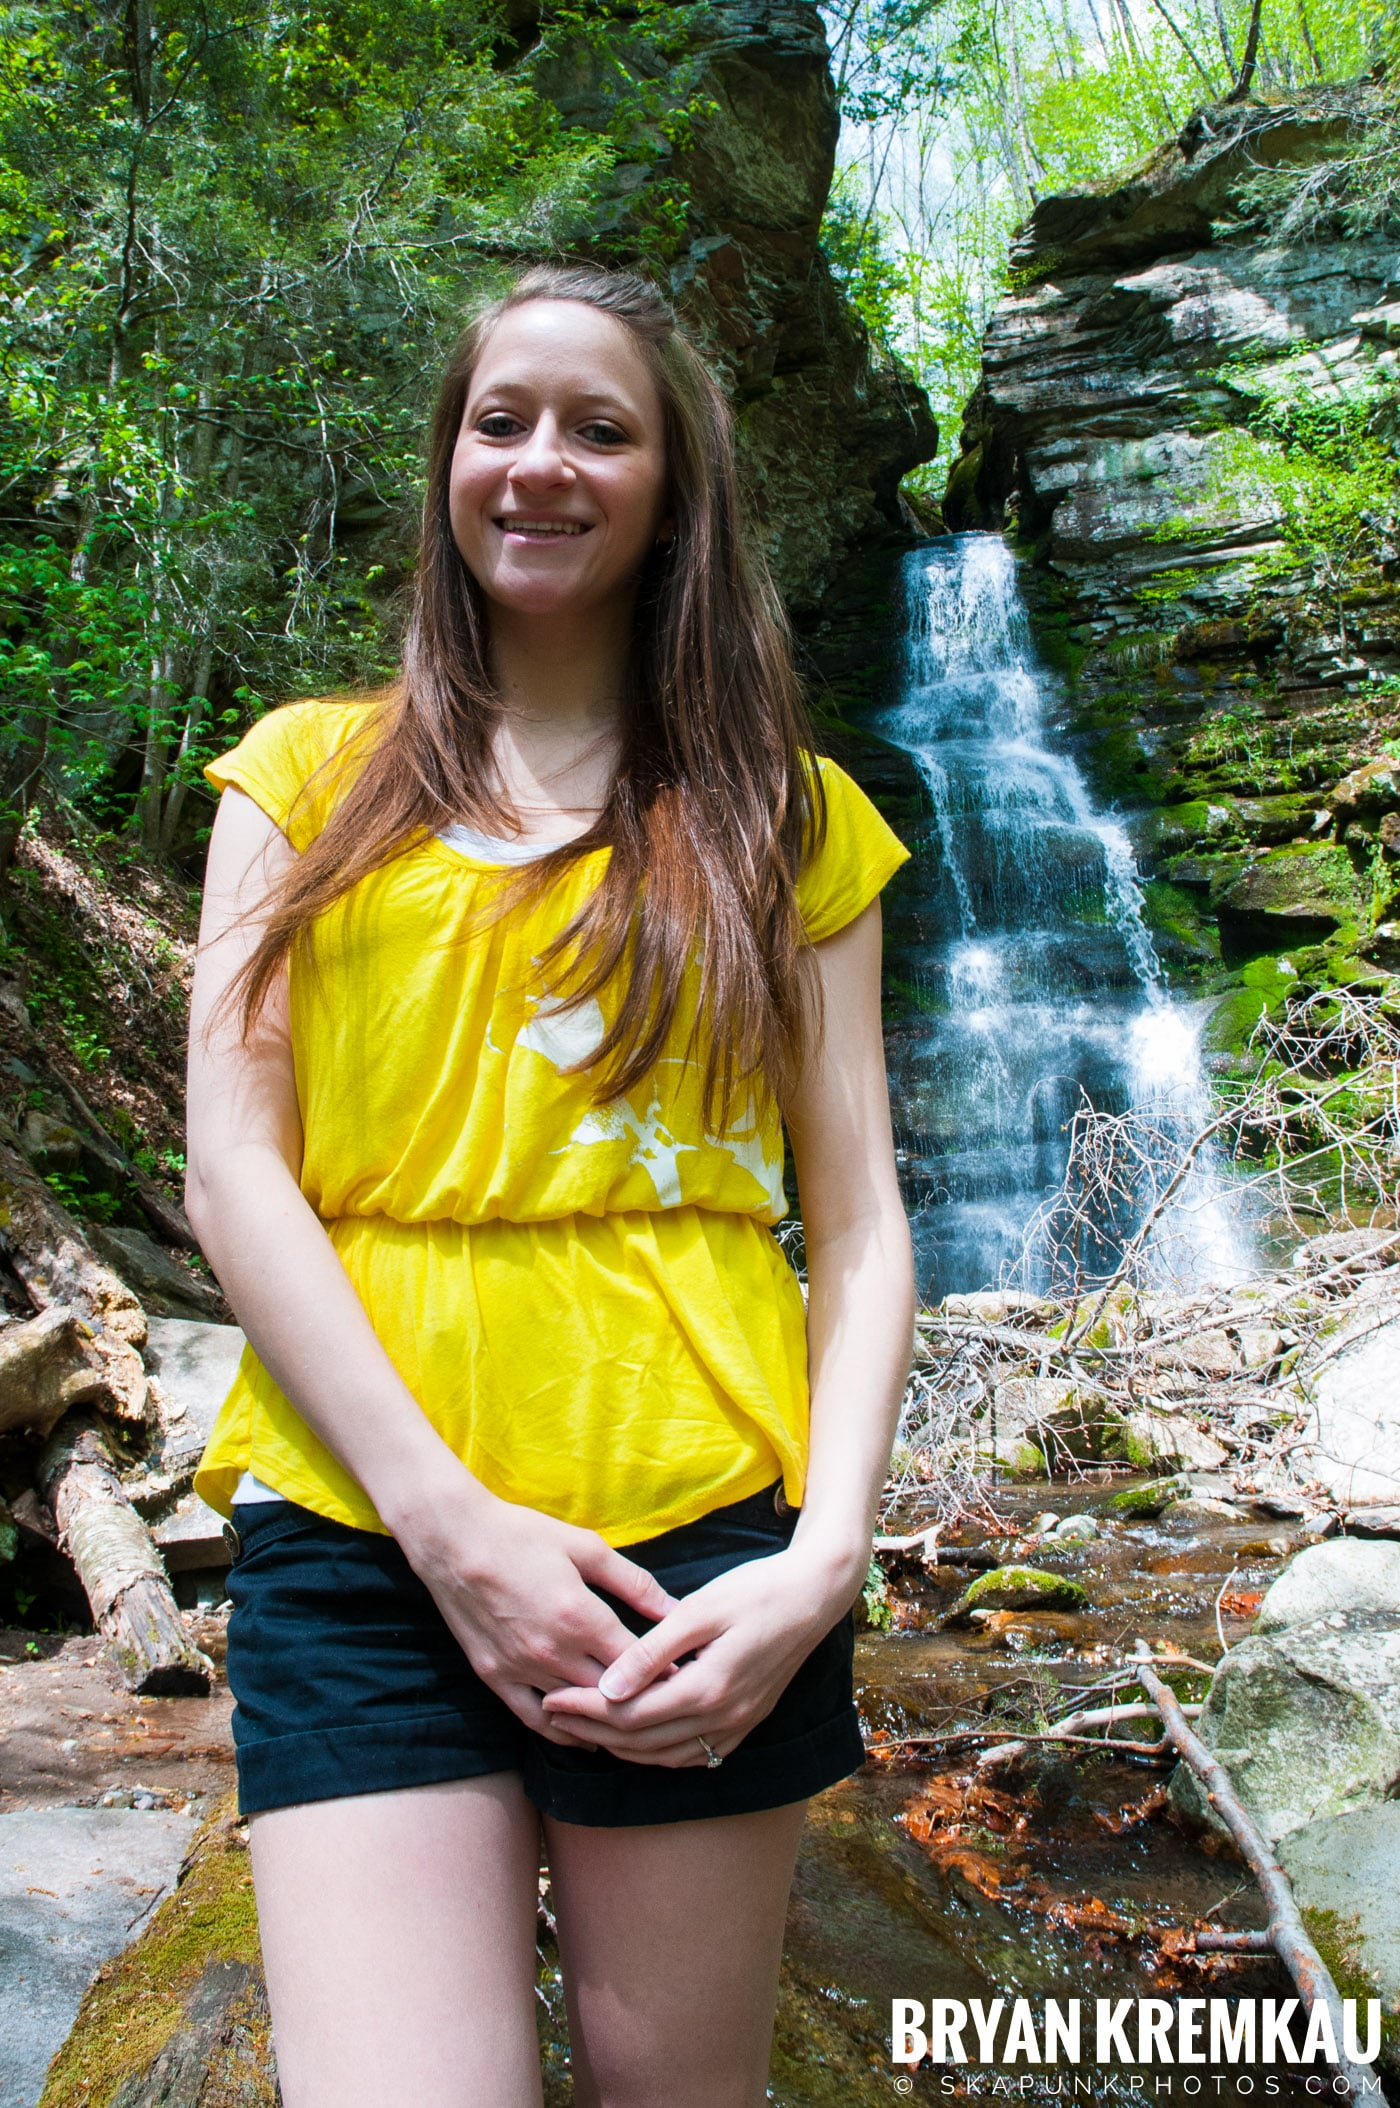 Getting Engaged @ Peekamoose Waterfall, Sundown NY - 5.1.10 (19)